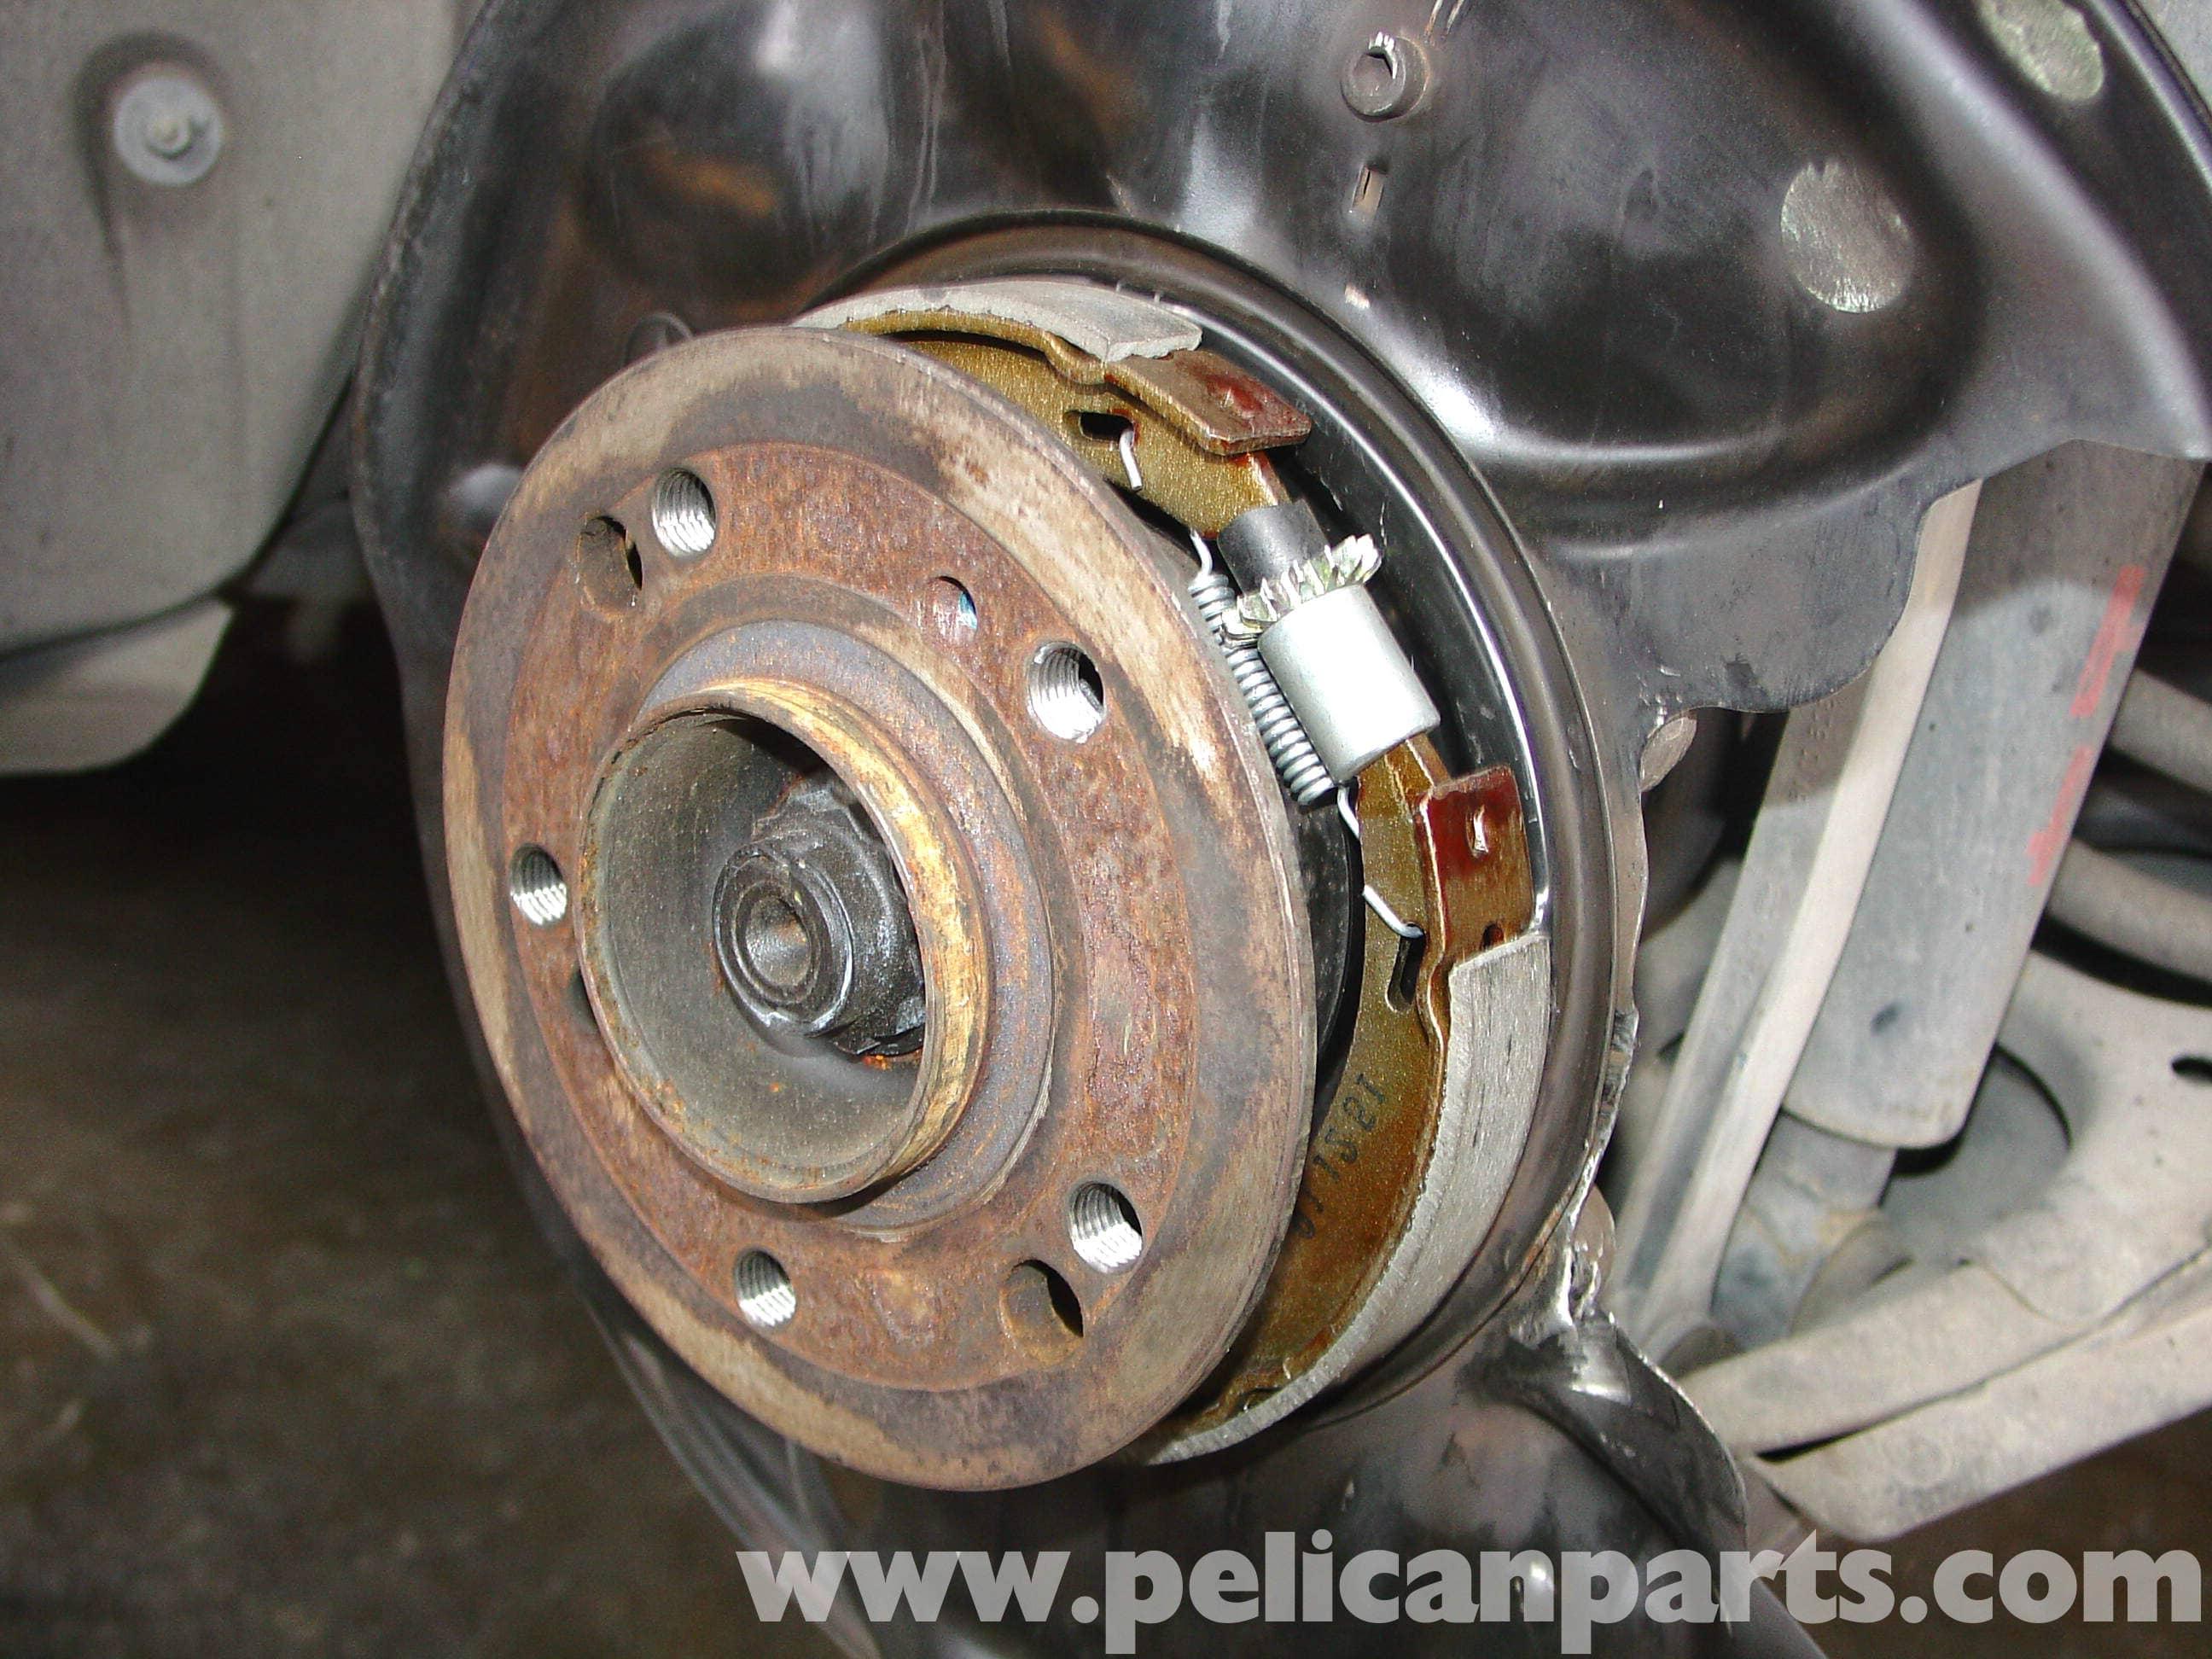 Mercedes Benz W124 Parking Brake Shoe Replacement 1986